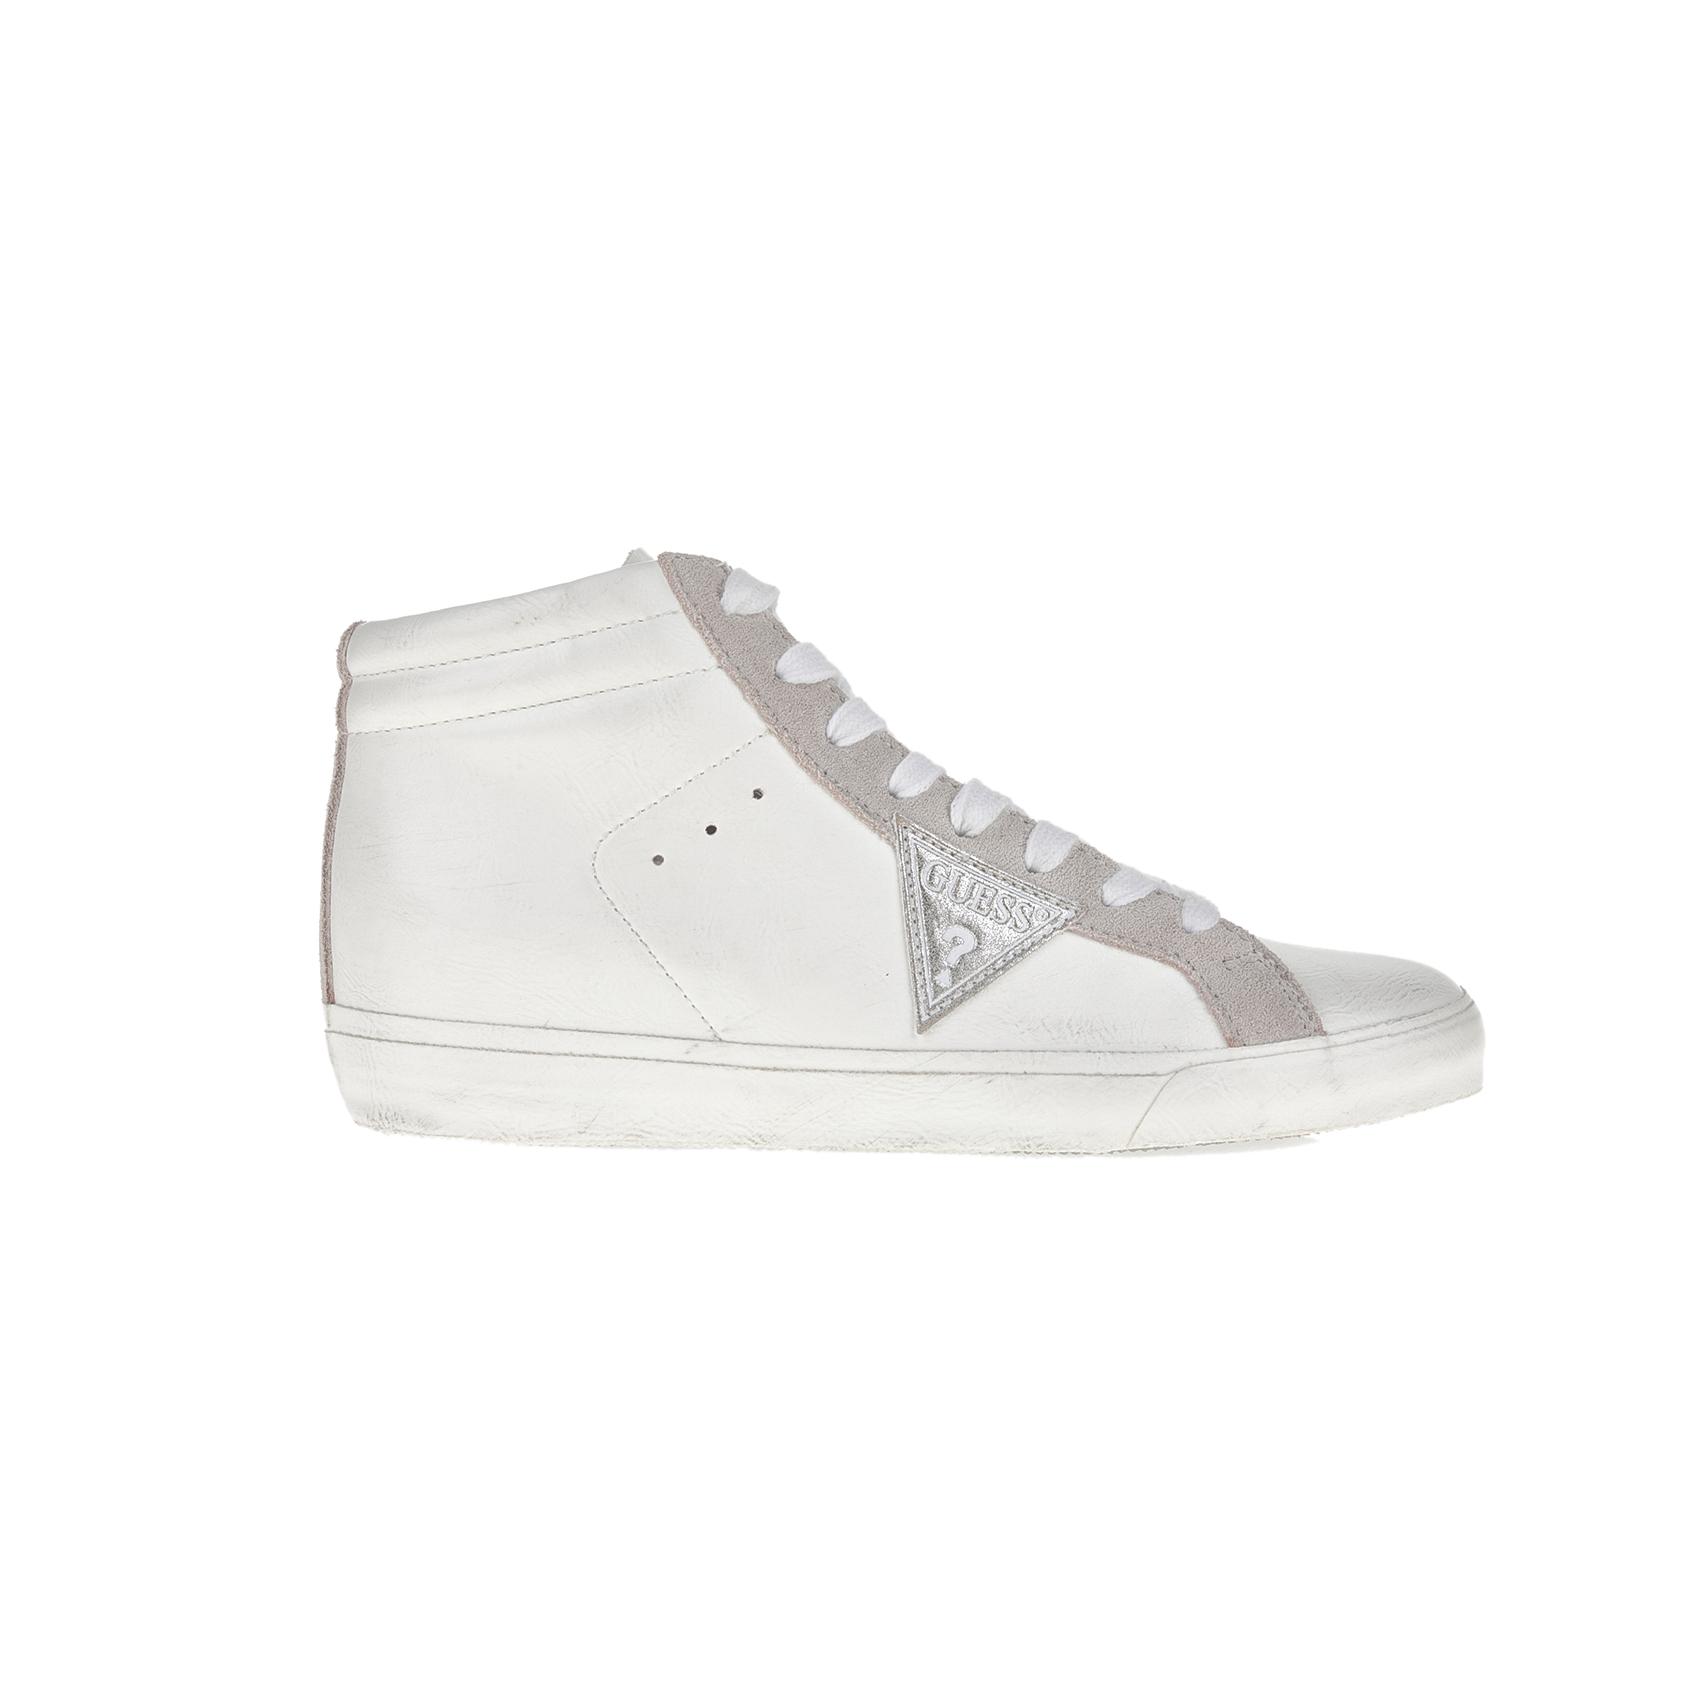 GUESS - Γυναικεία sneakers GUESS λευκά γυναικεία παπούτσια sneakers